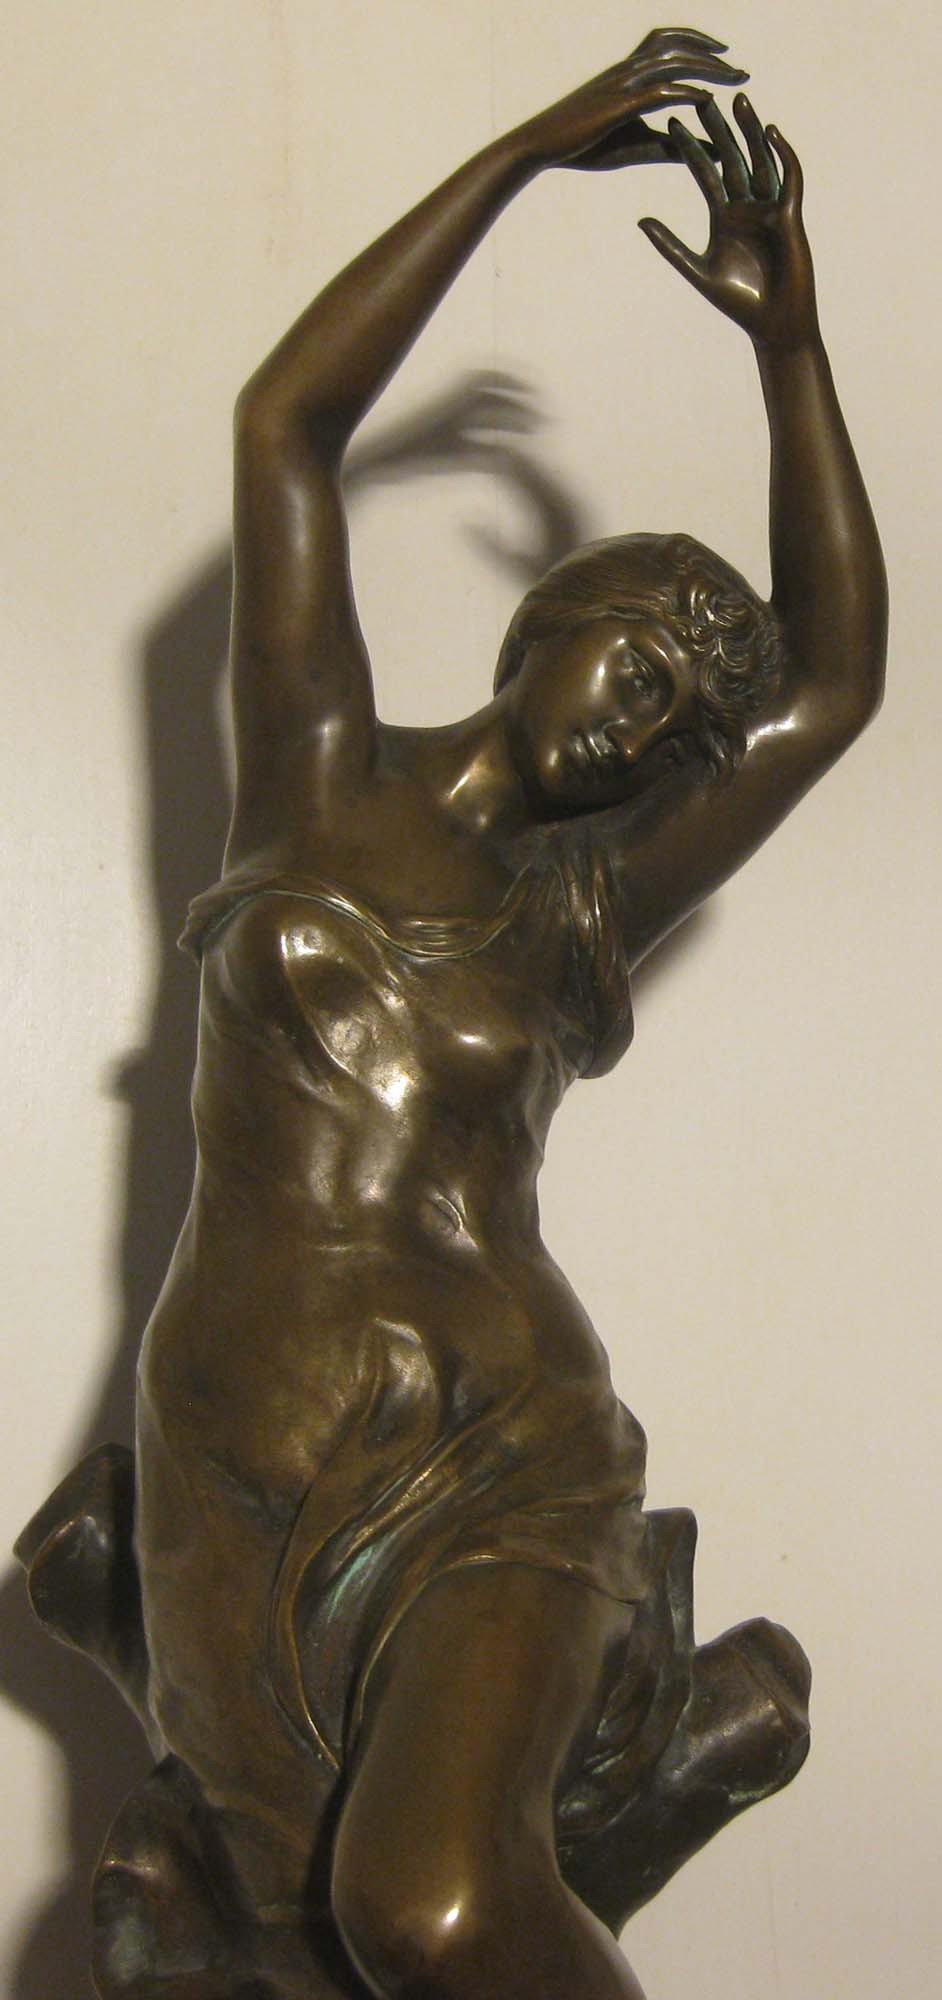 galerie-bosetti-antiquites, sculpture bronze L. MADRASSI Sculpture détail corps